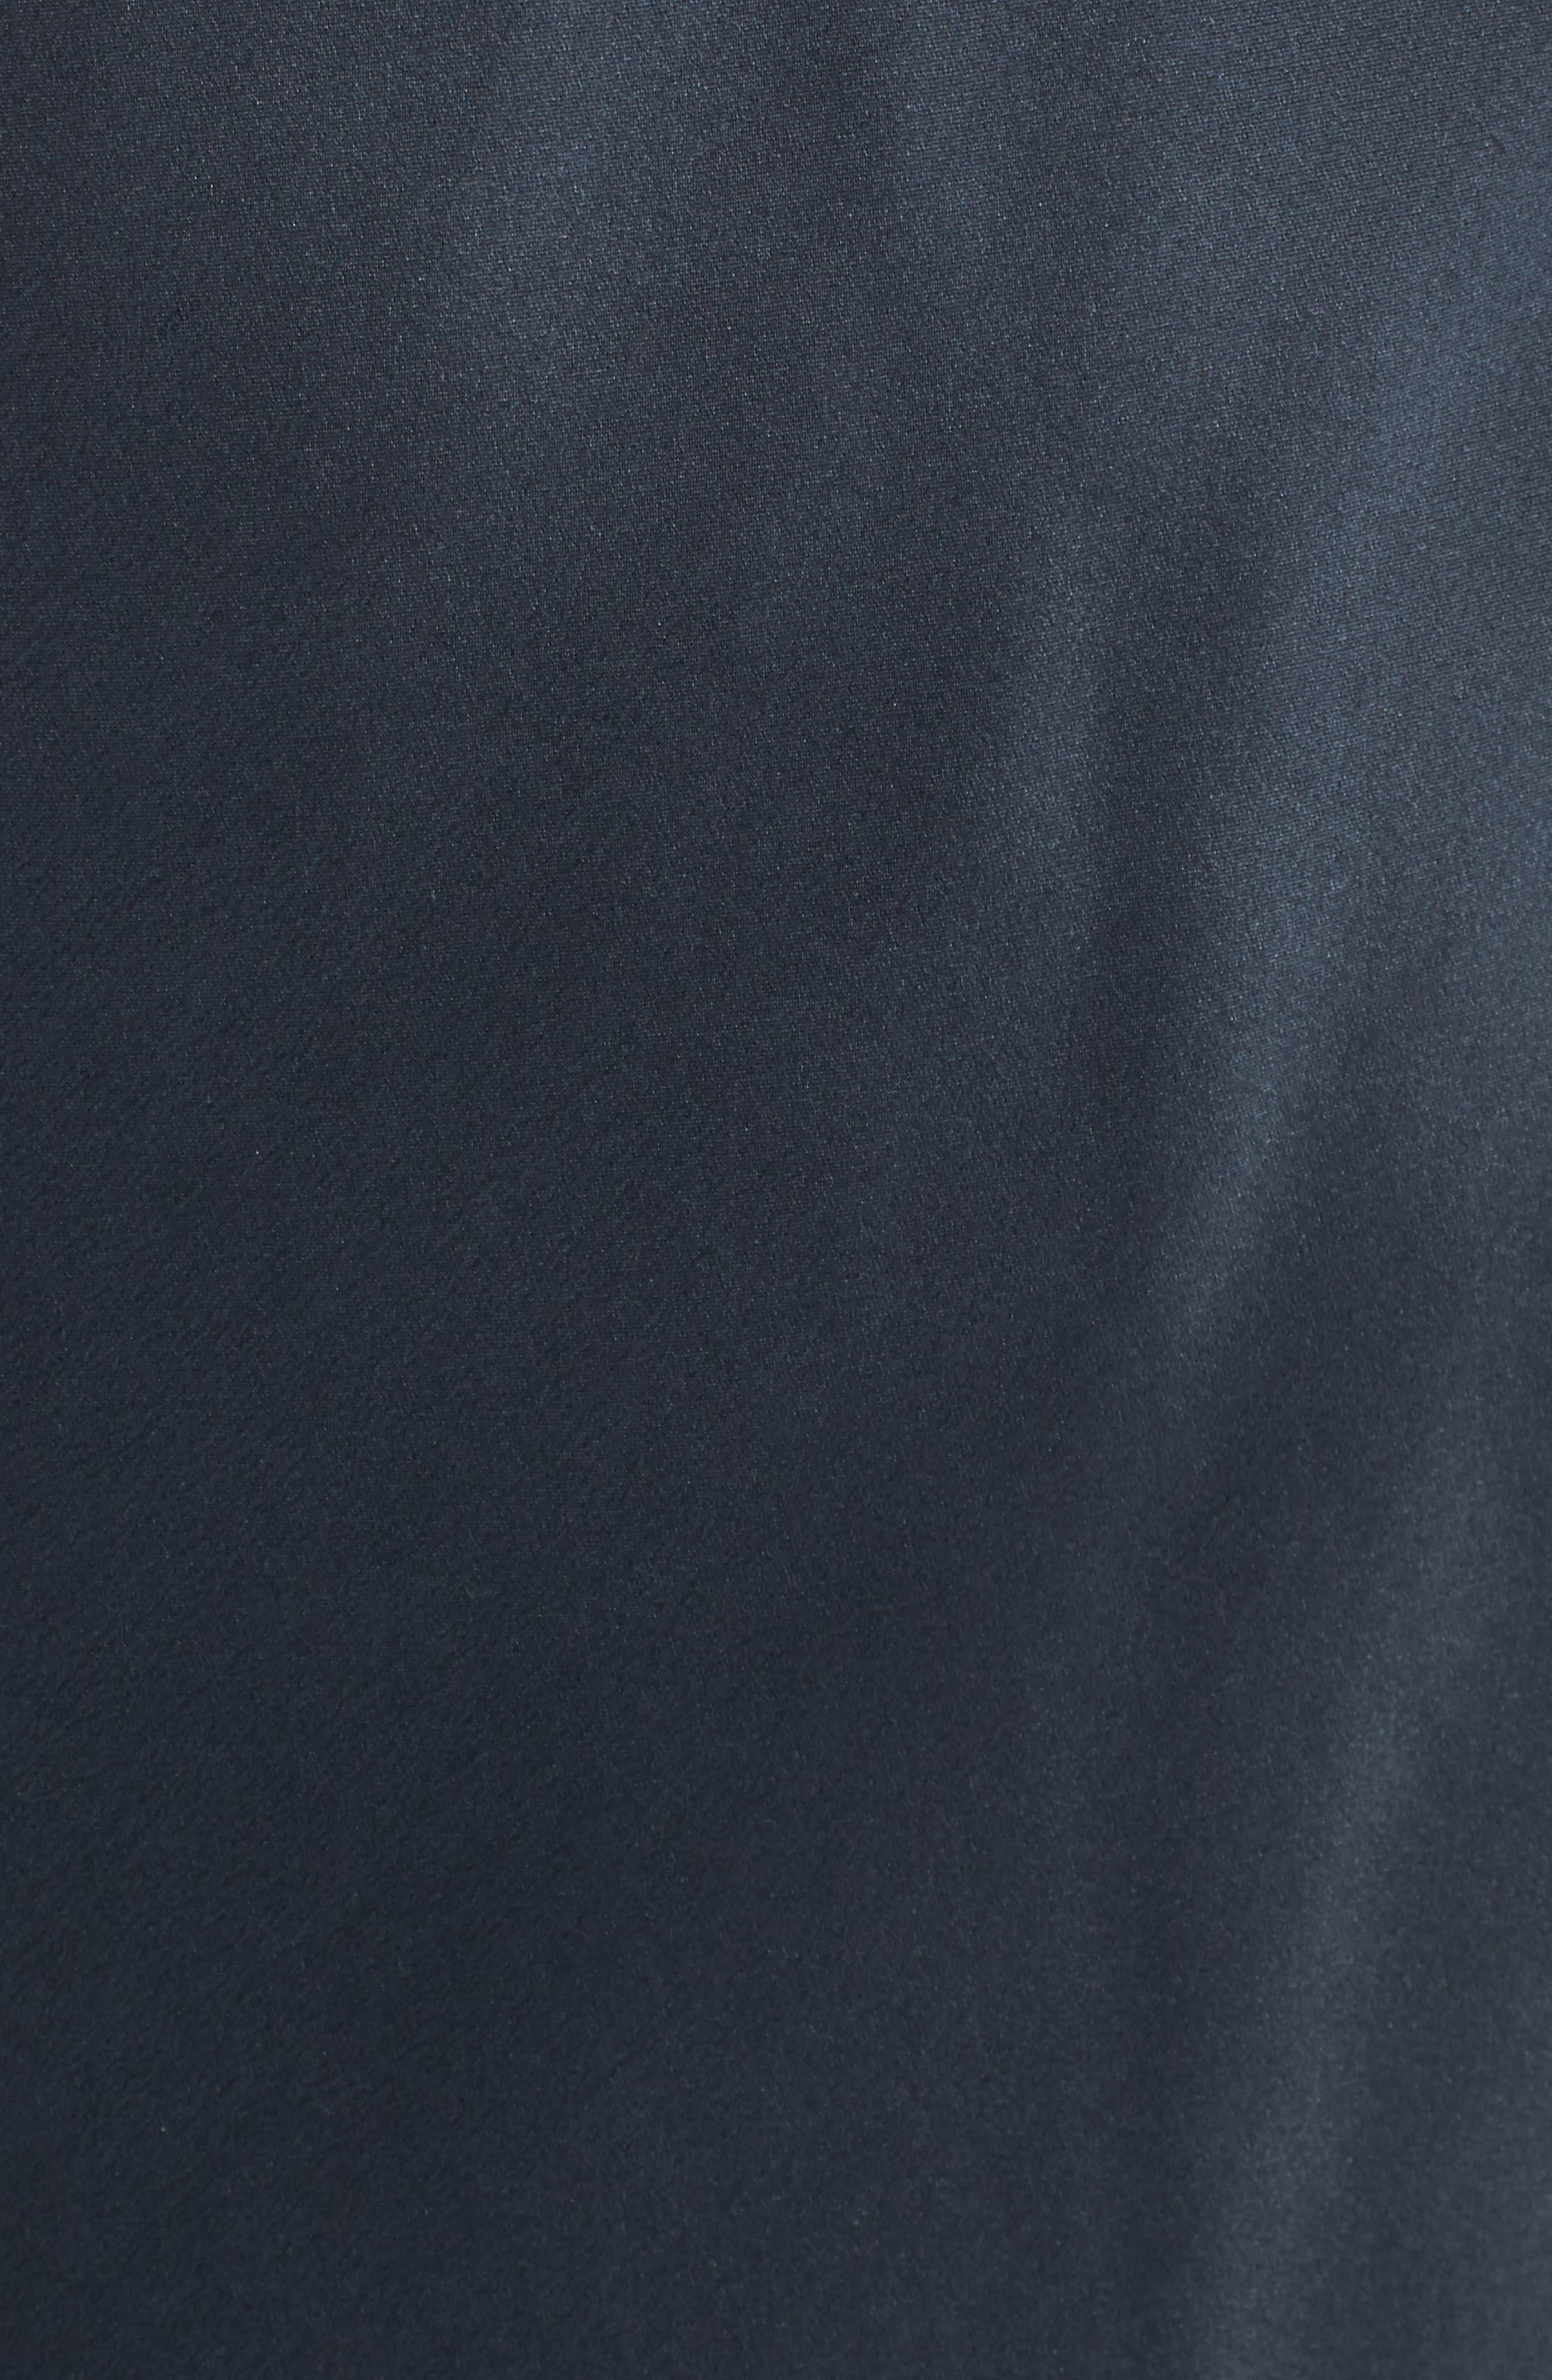 Bias Cut Silk Skirt,                             Alternate thumbnail 5, color,                             025